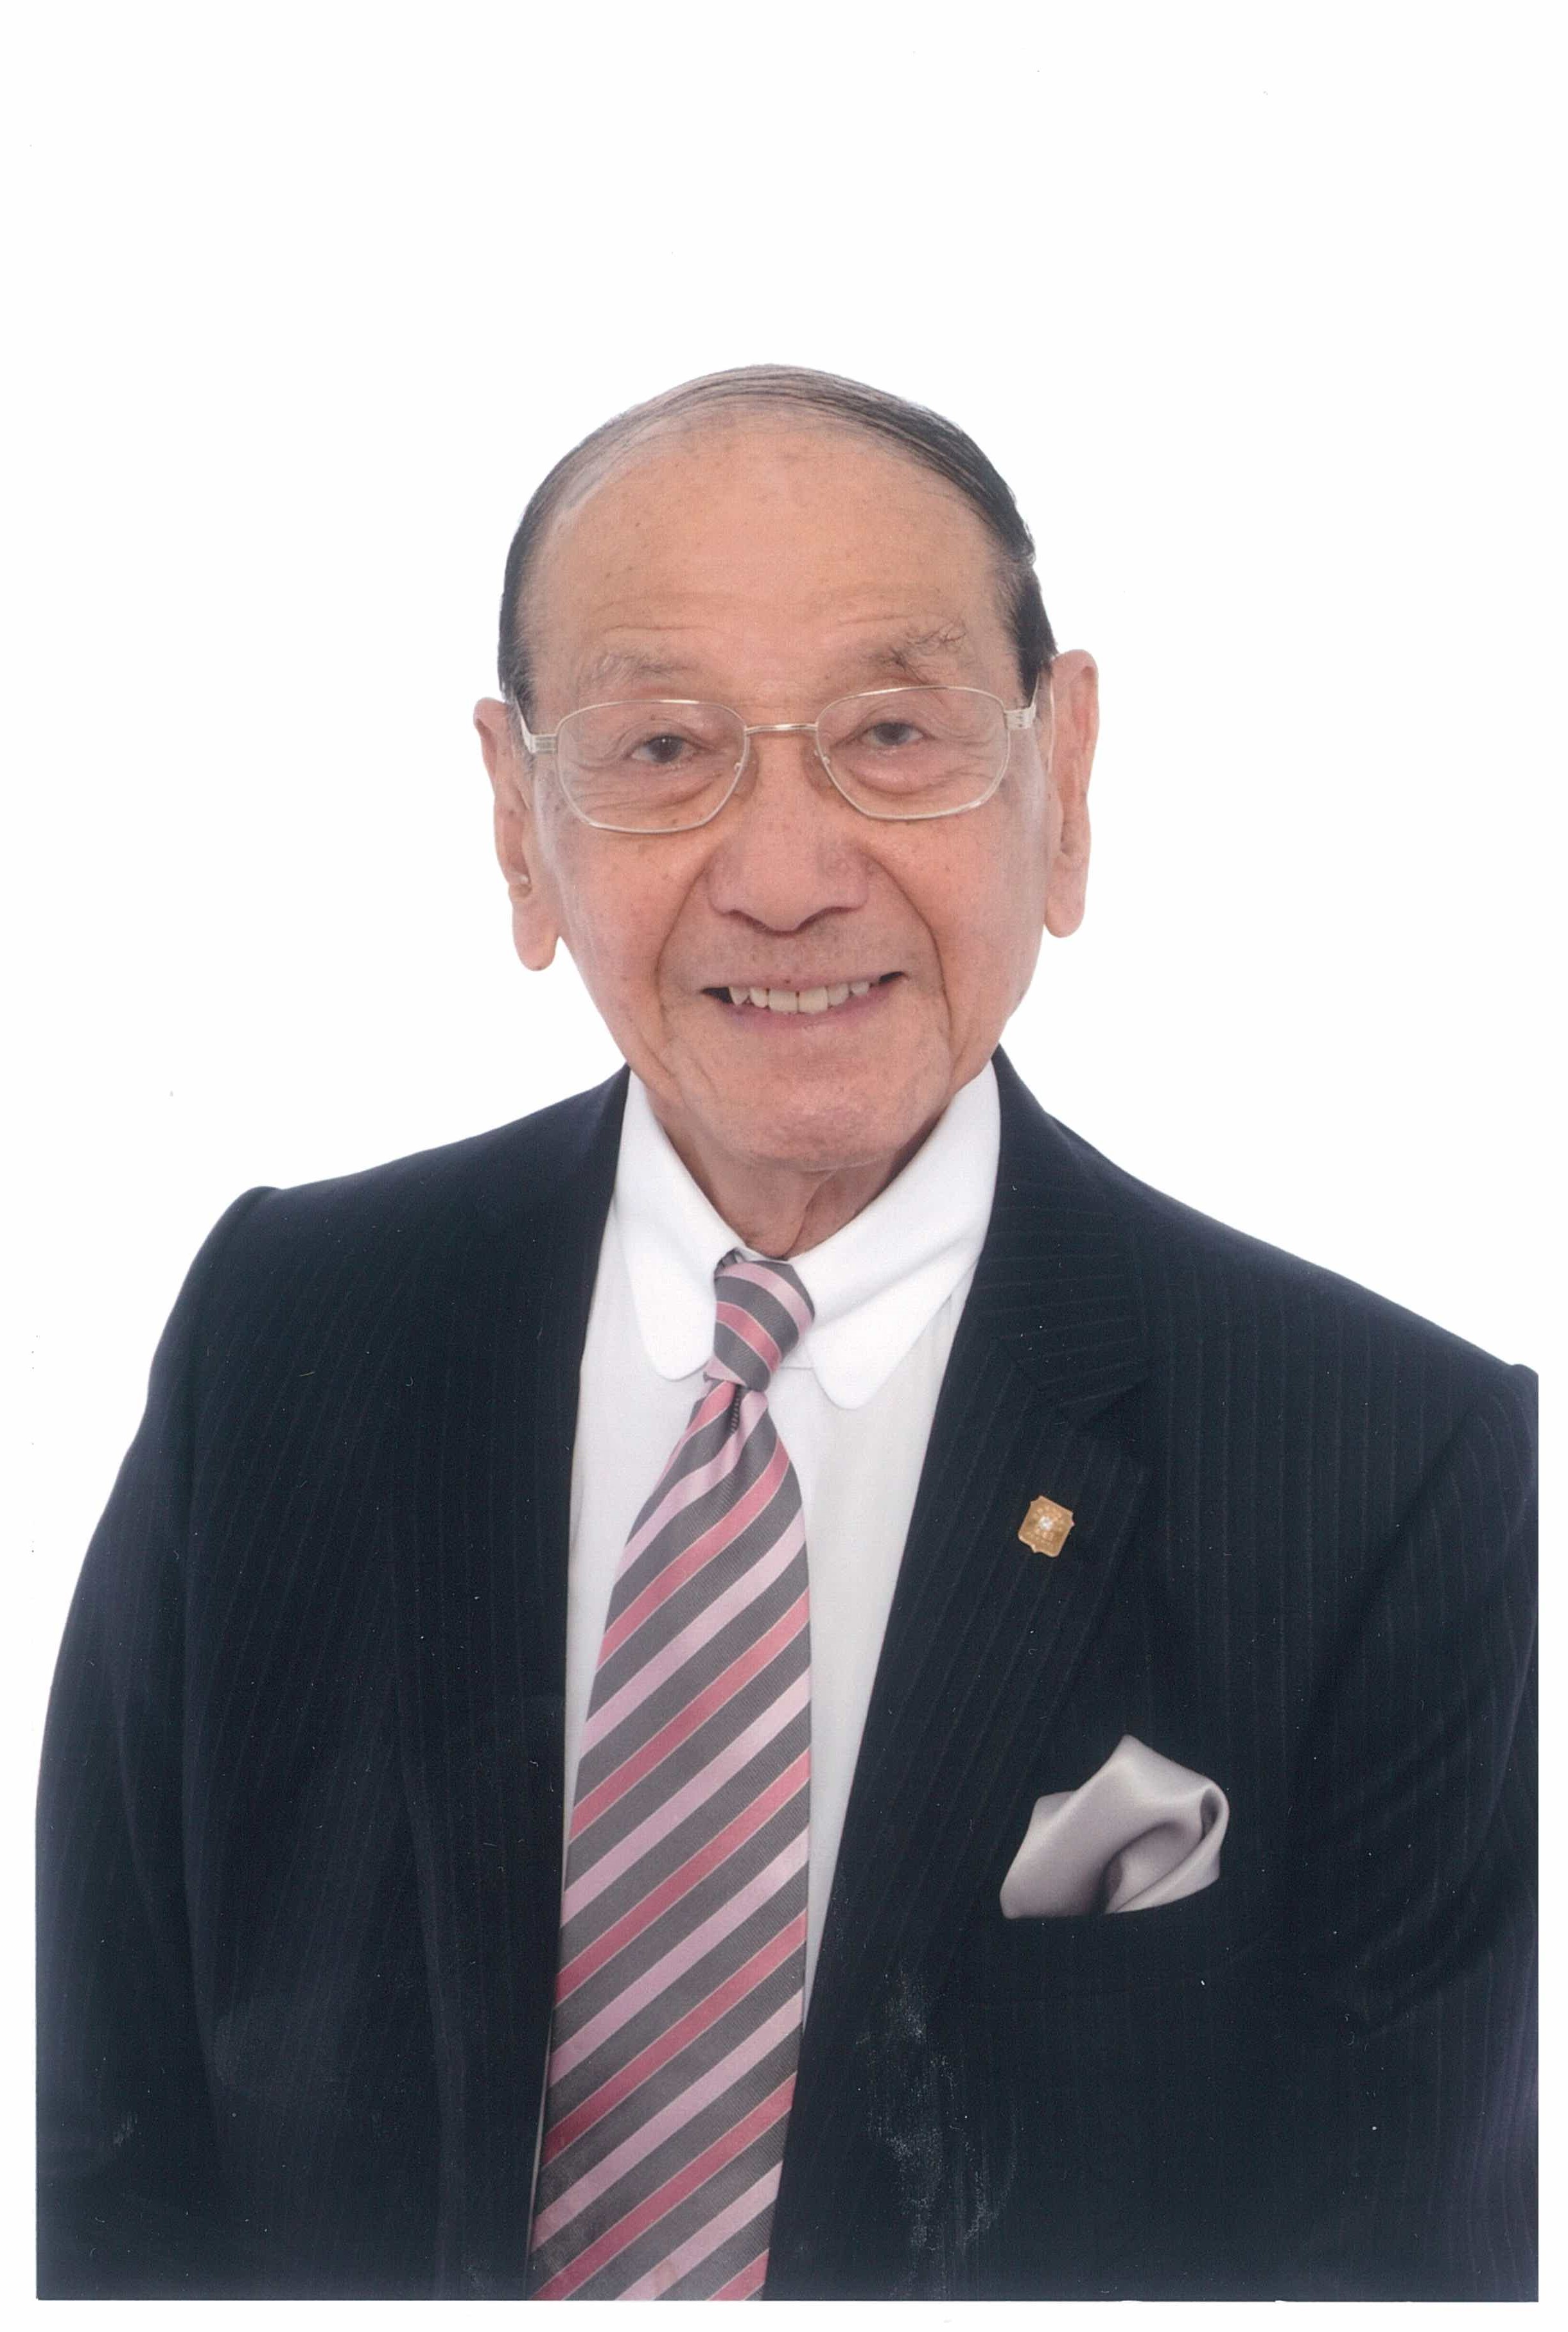 Dr. Samson SUN M.B.E., J.P., D.C. Sc.